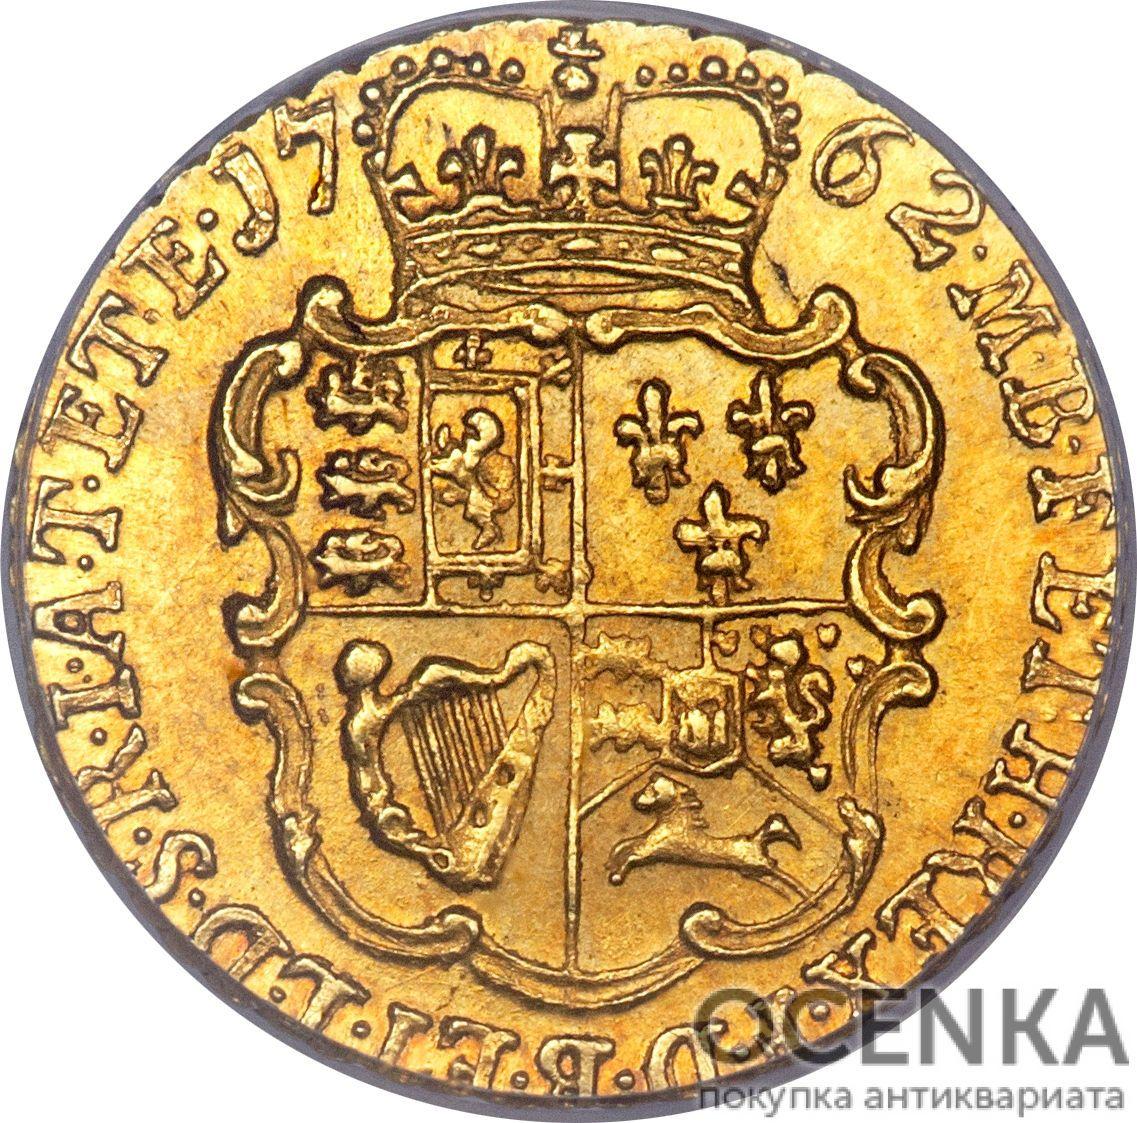 Золотая монета ¼ Guinea (1/4 гинеи) Великобритания - 2